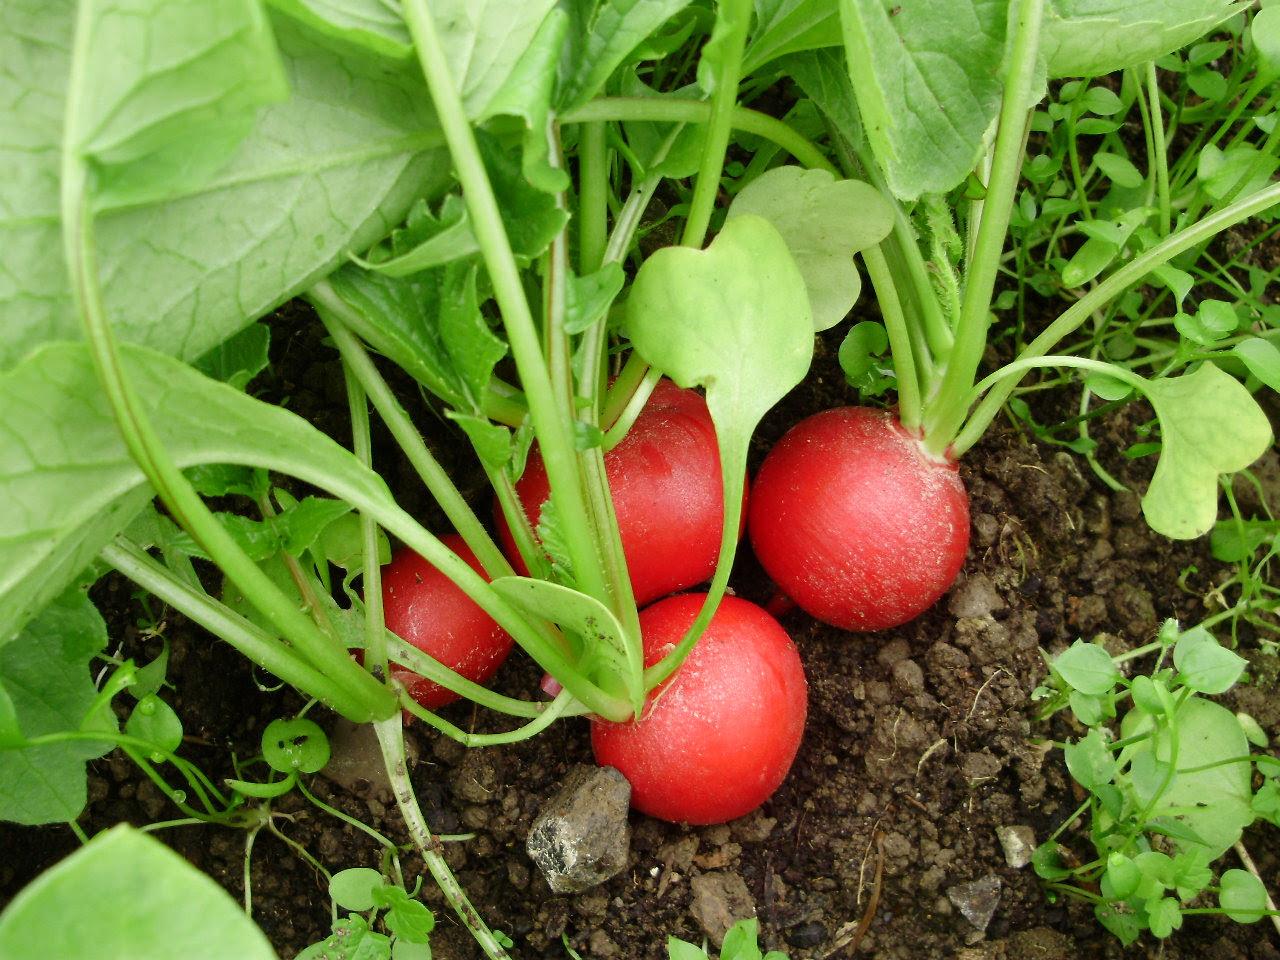 Radish 'Rudi' crunchy, delicious & easy to grow